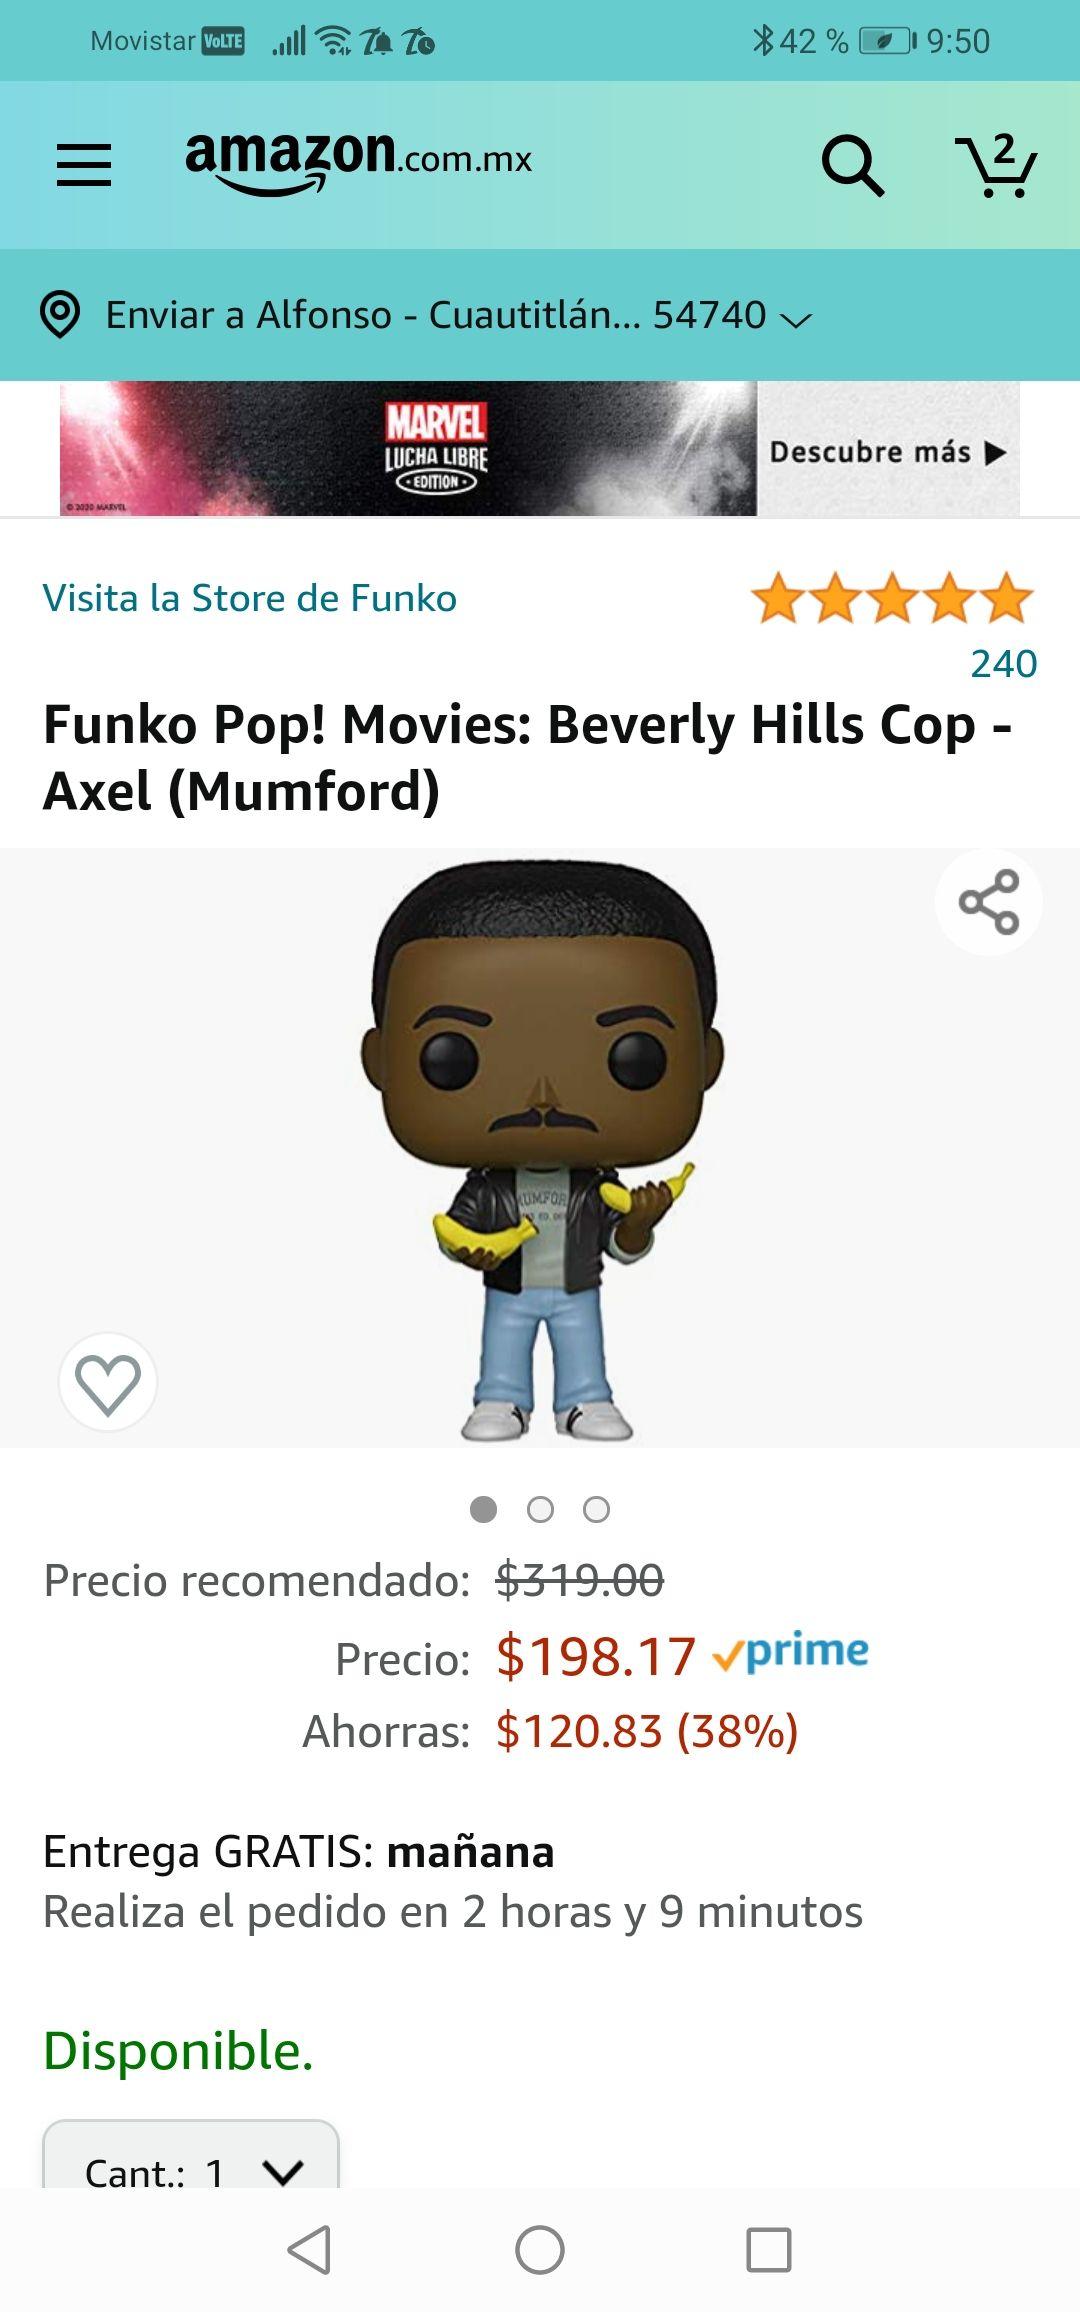 Amazon: Funko Pop! Movies: Beverly Hills Cop - Axel (Mumford)